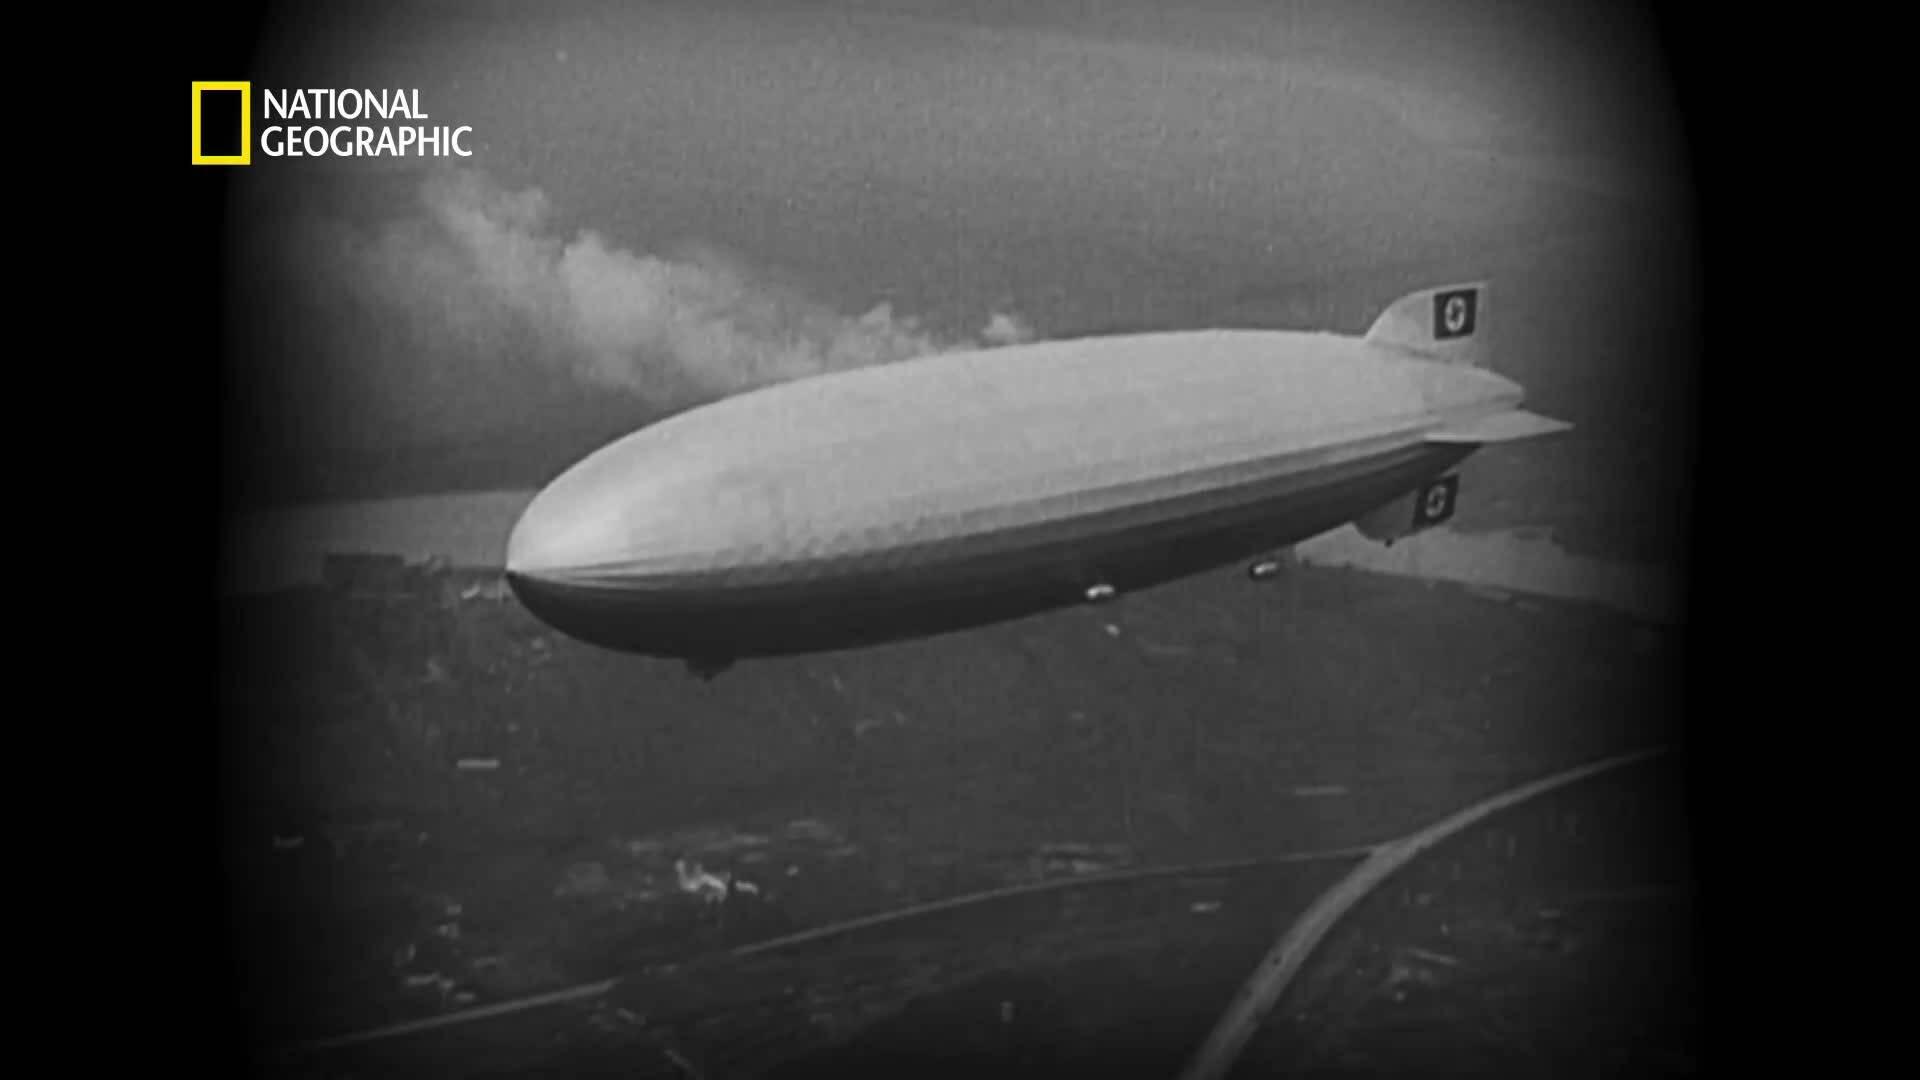 премиера 8 юни 22:00 | Хинденбург: Нови доказателства | National Geographic Bulgaria